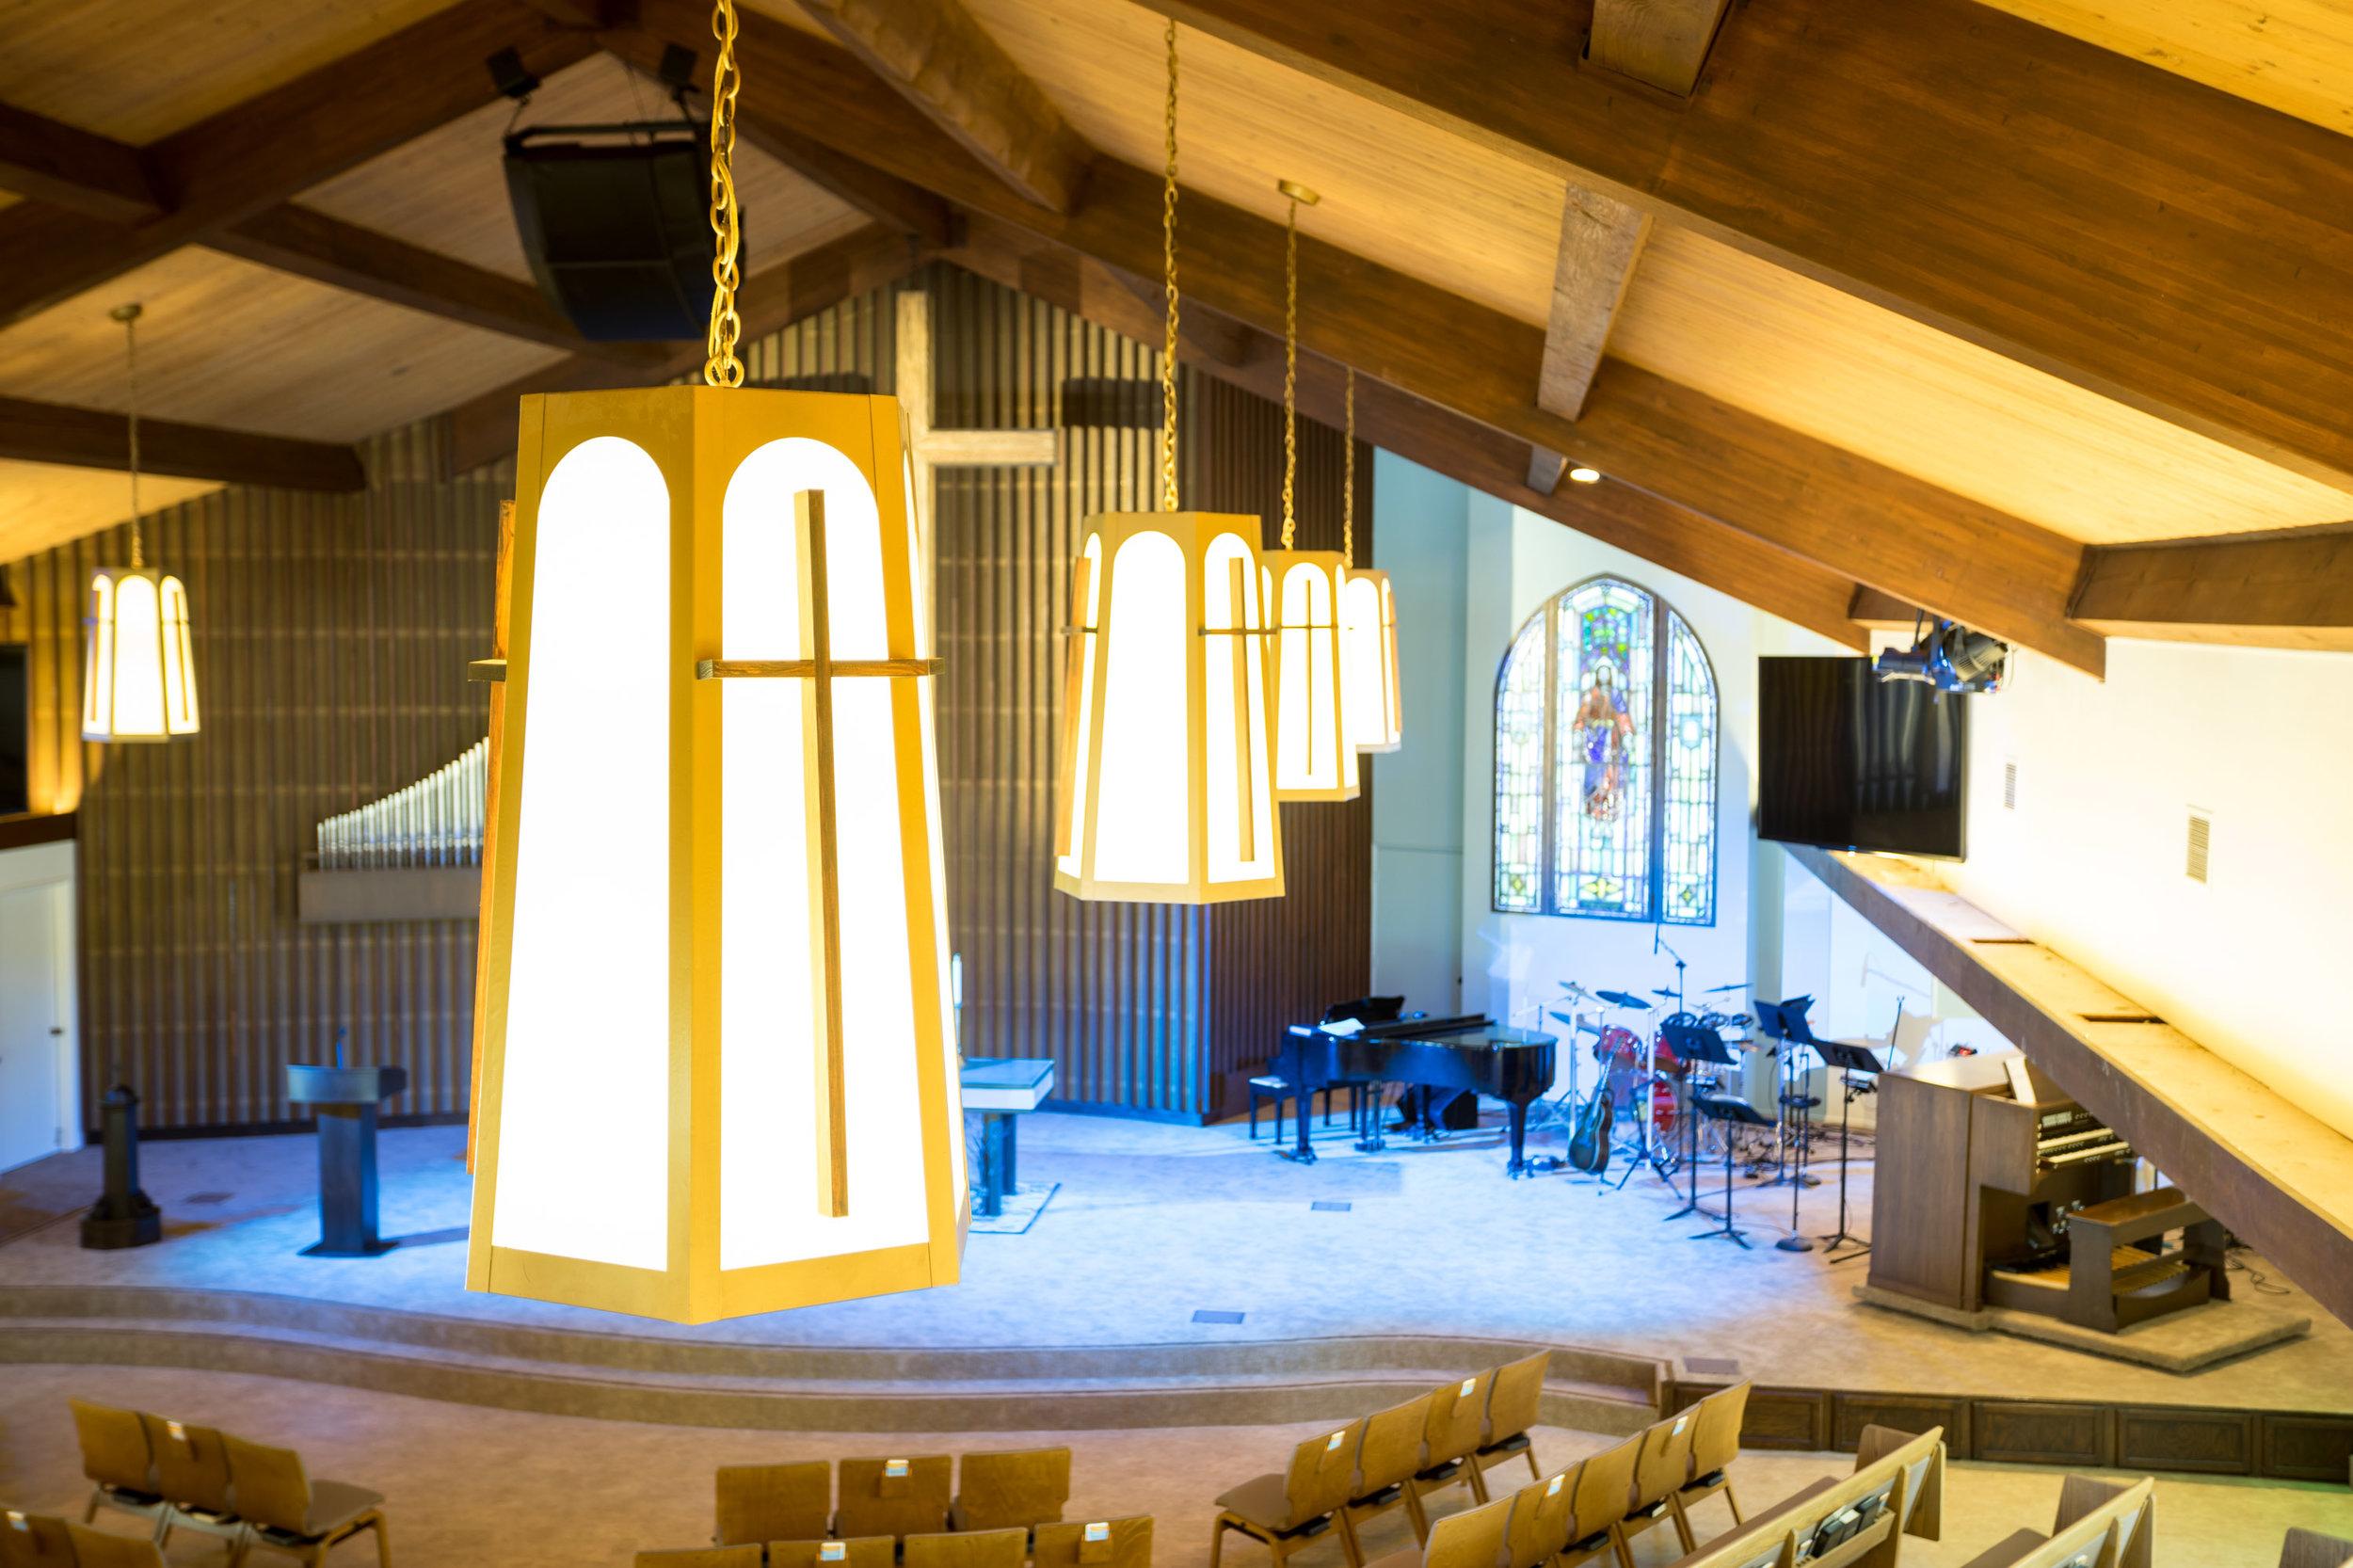 Yorba Linda church-5.jpg